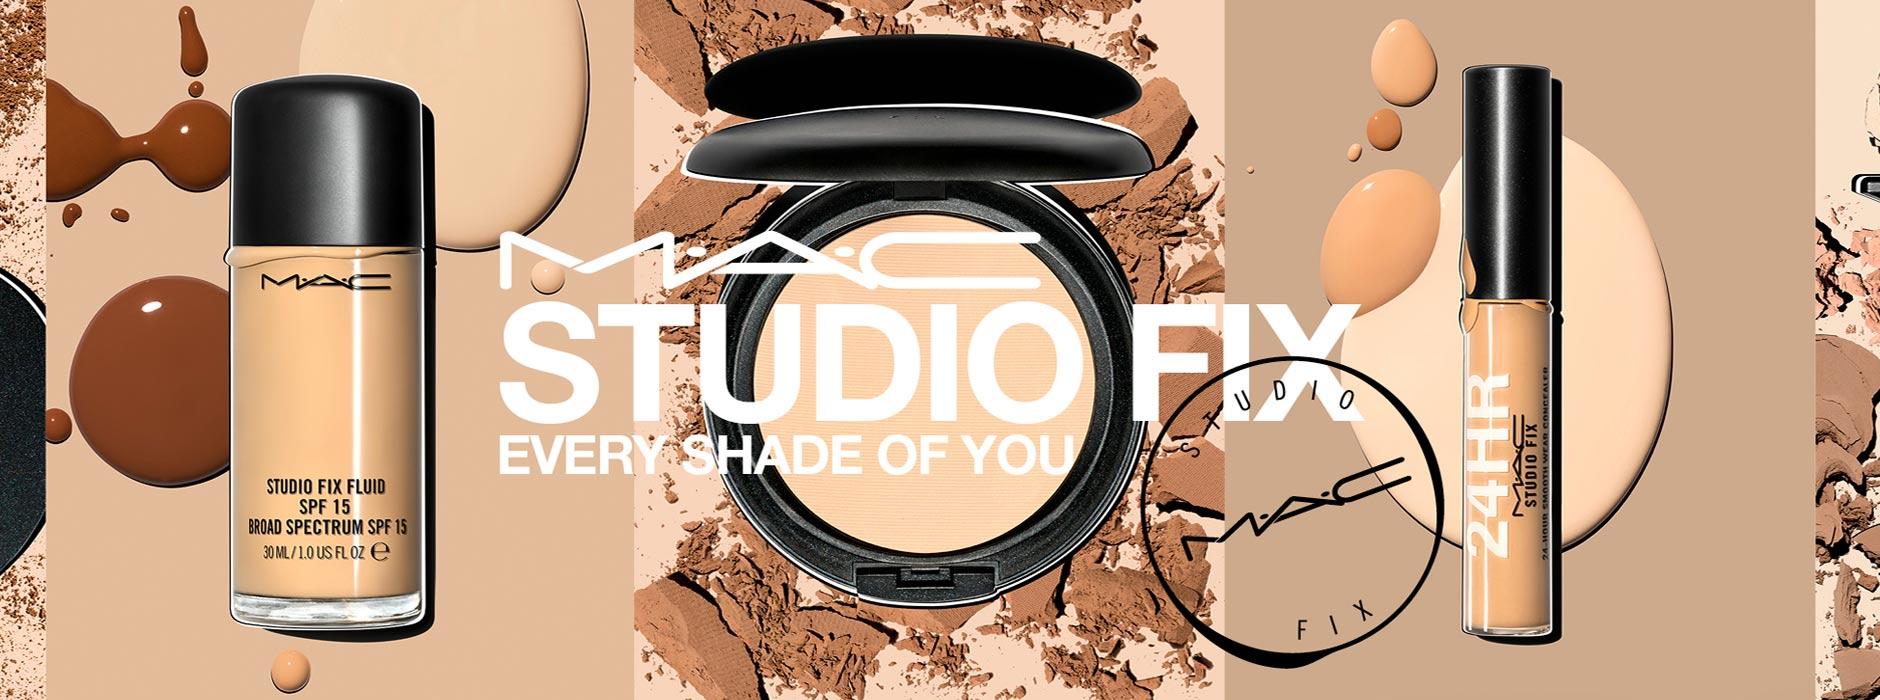 M·A·C Studio Fix